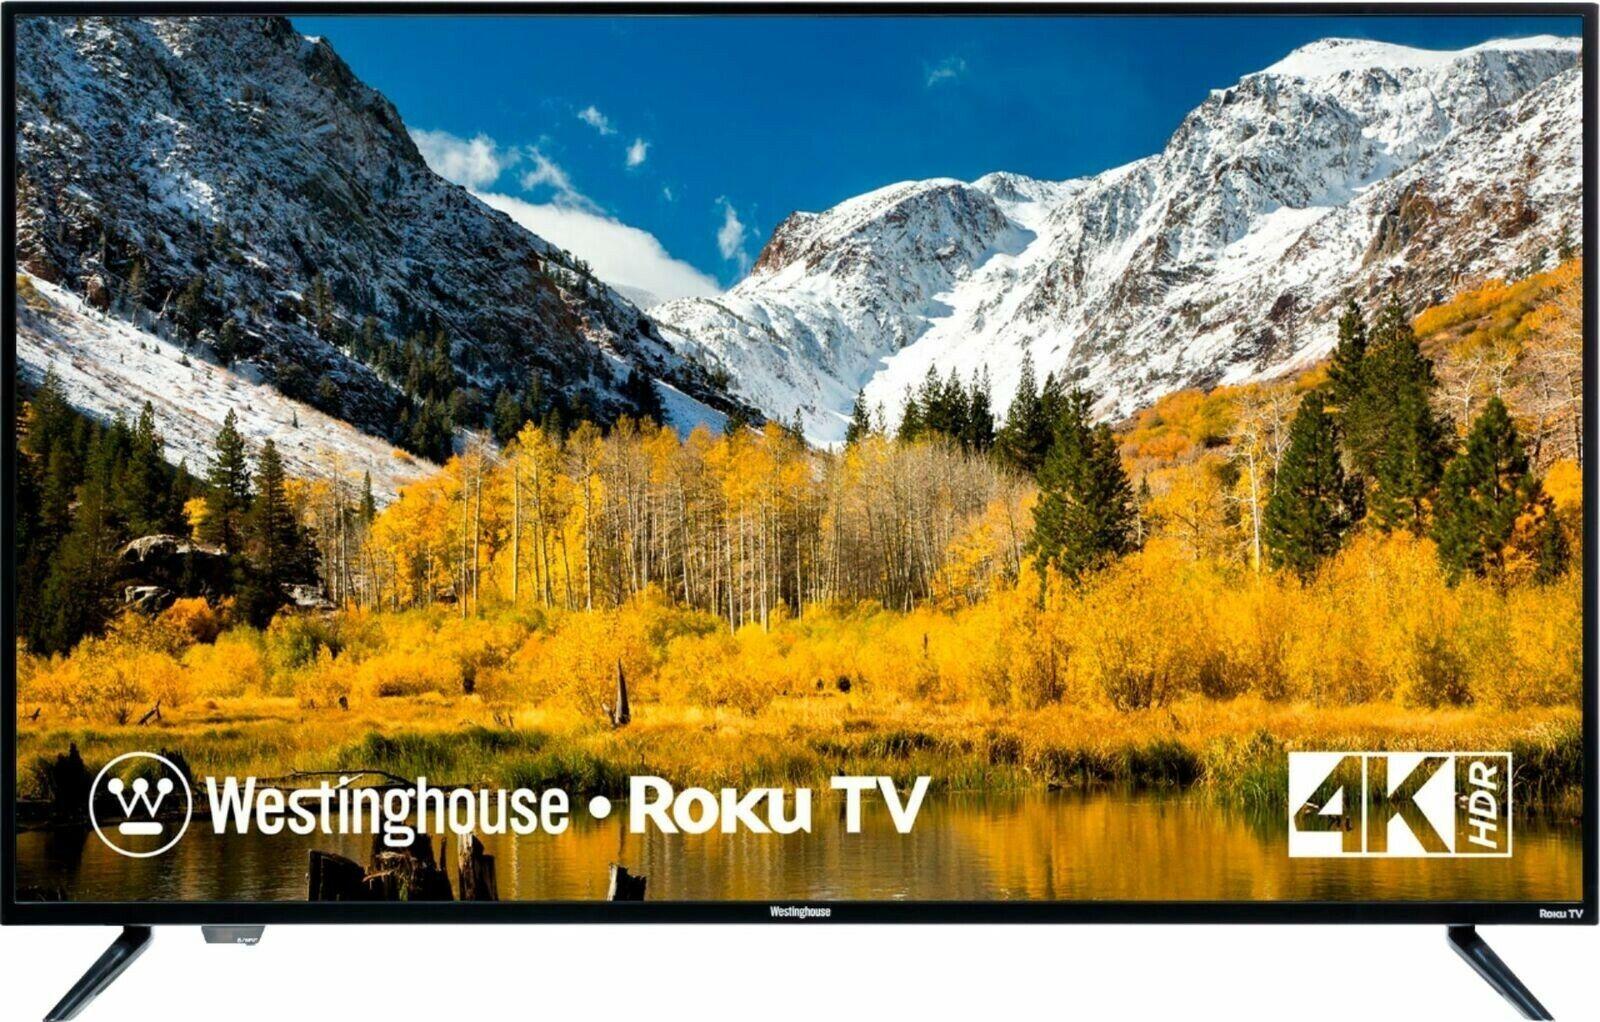 "50"" Westinghouse TV - LED 2160p Smart TV 4K UHD TV with HDR - Roku TV"